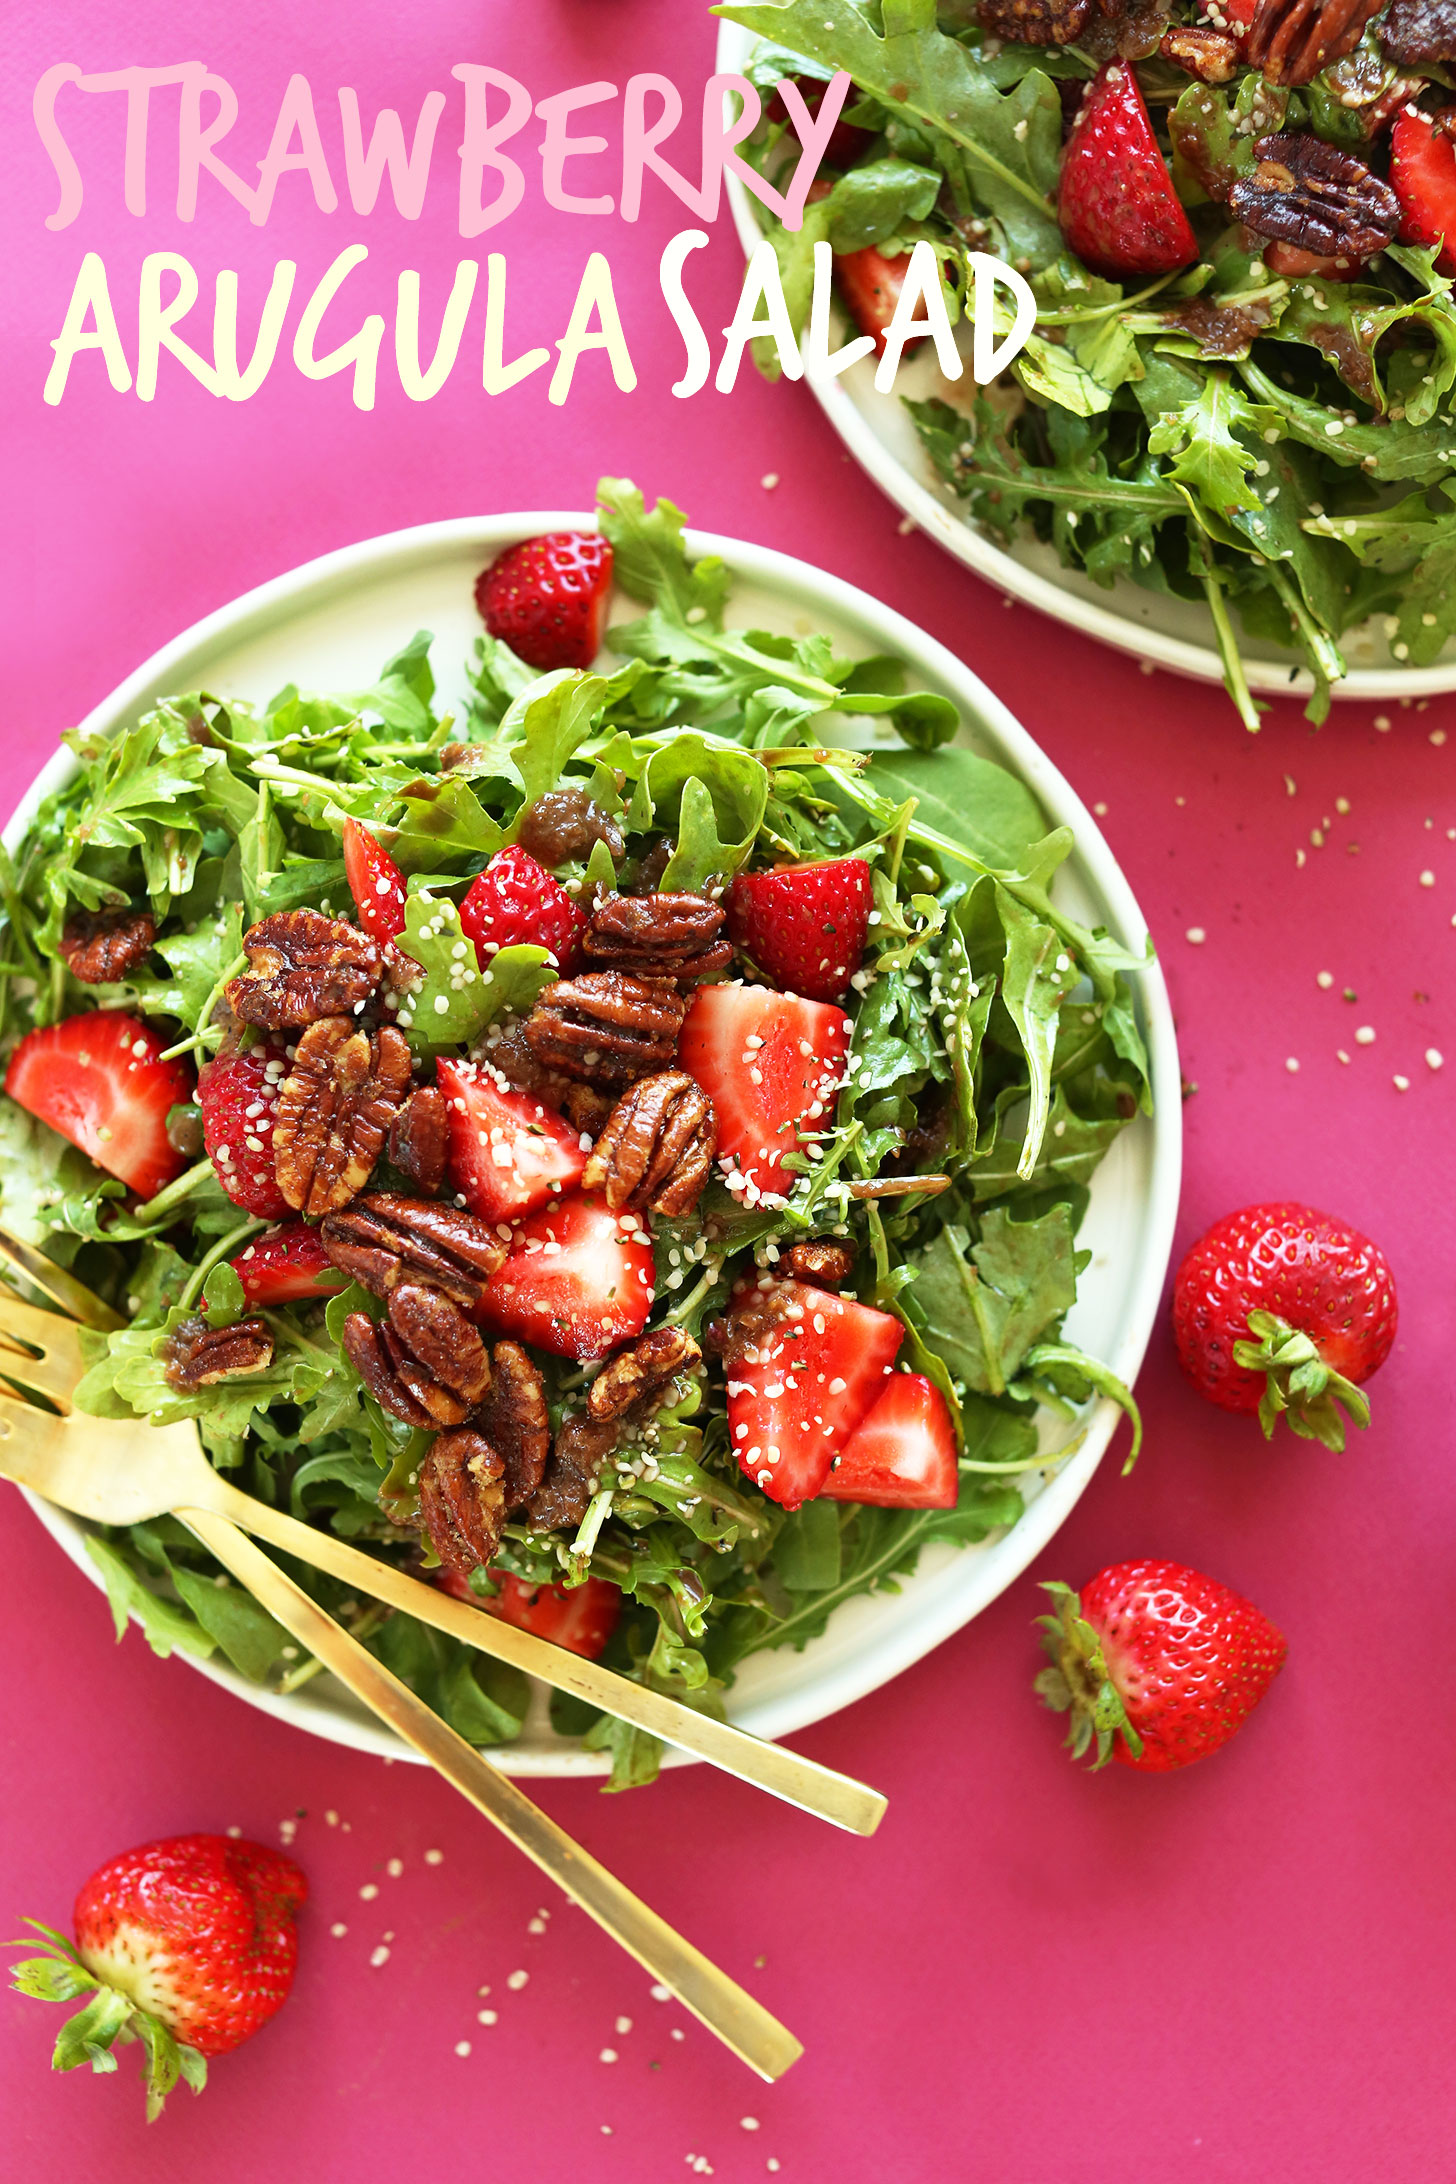 Strawberry Arugula Salad with Brown Sugar Pecans and a Warm Shallot Vinaigrette! #vegan #recipe #salad #glutenfree #healthy #minimalistbaker